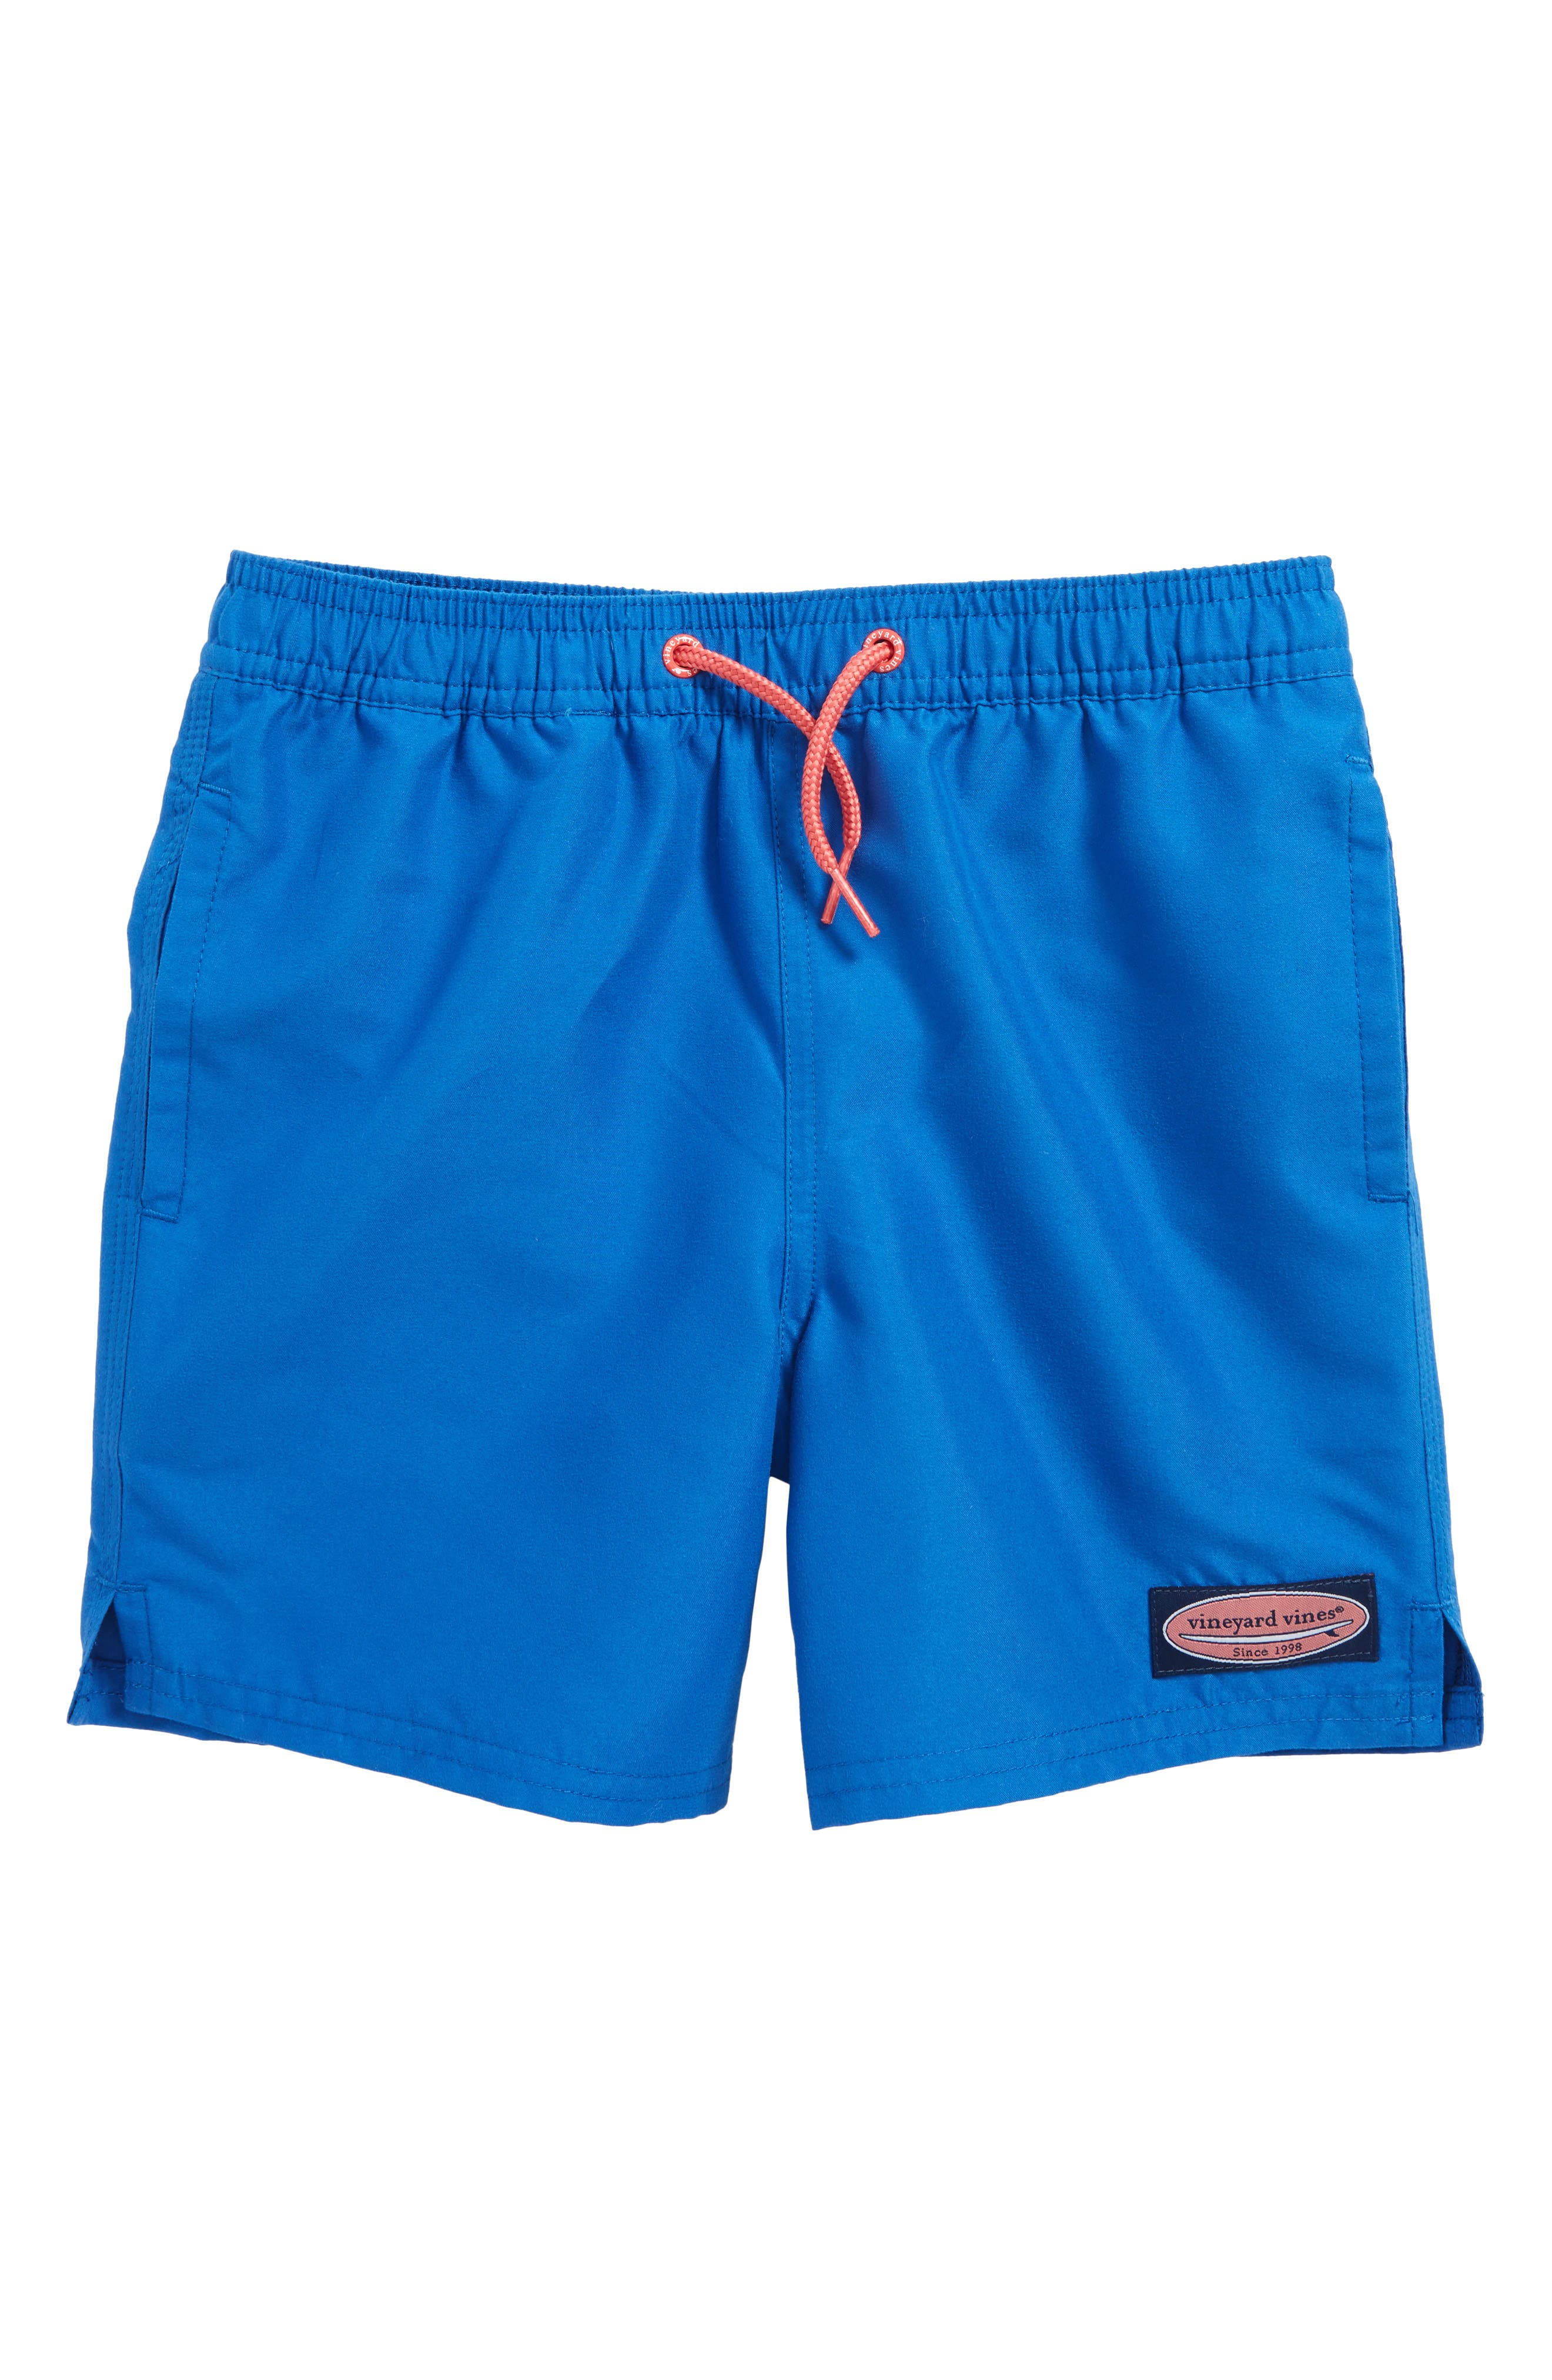 Bungalow Board Shorts,                         Main,                         color, Yacht Blue